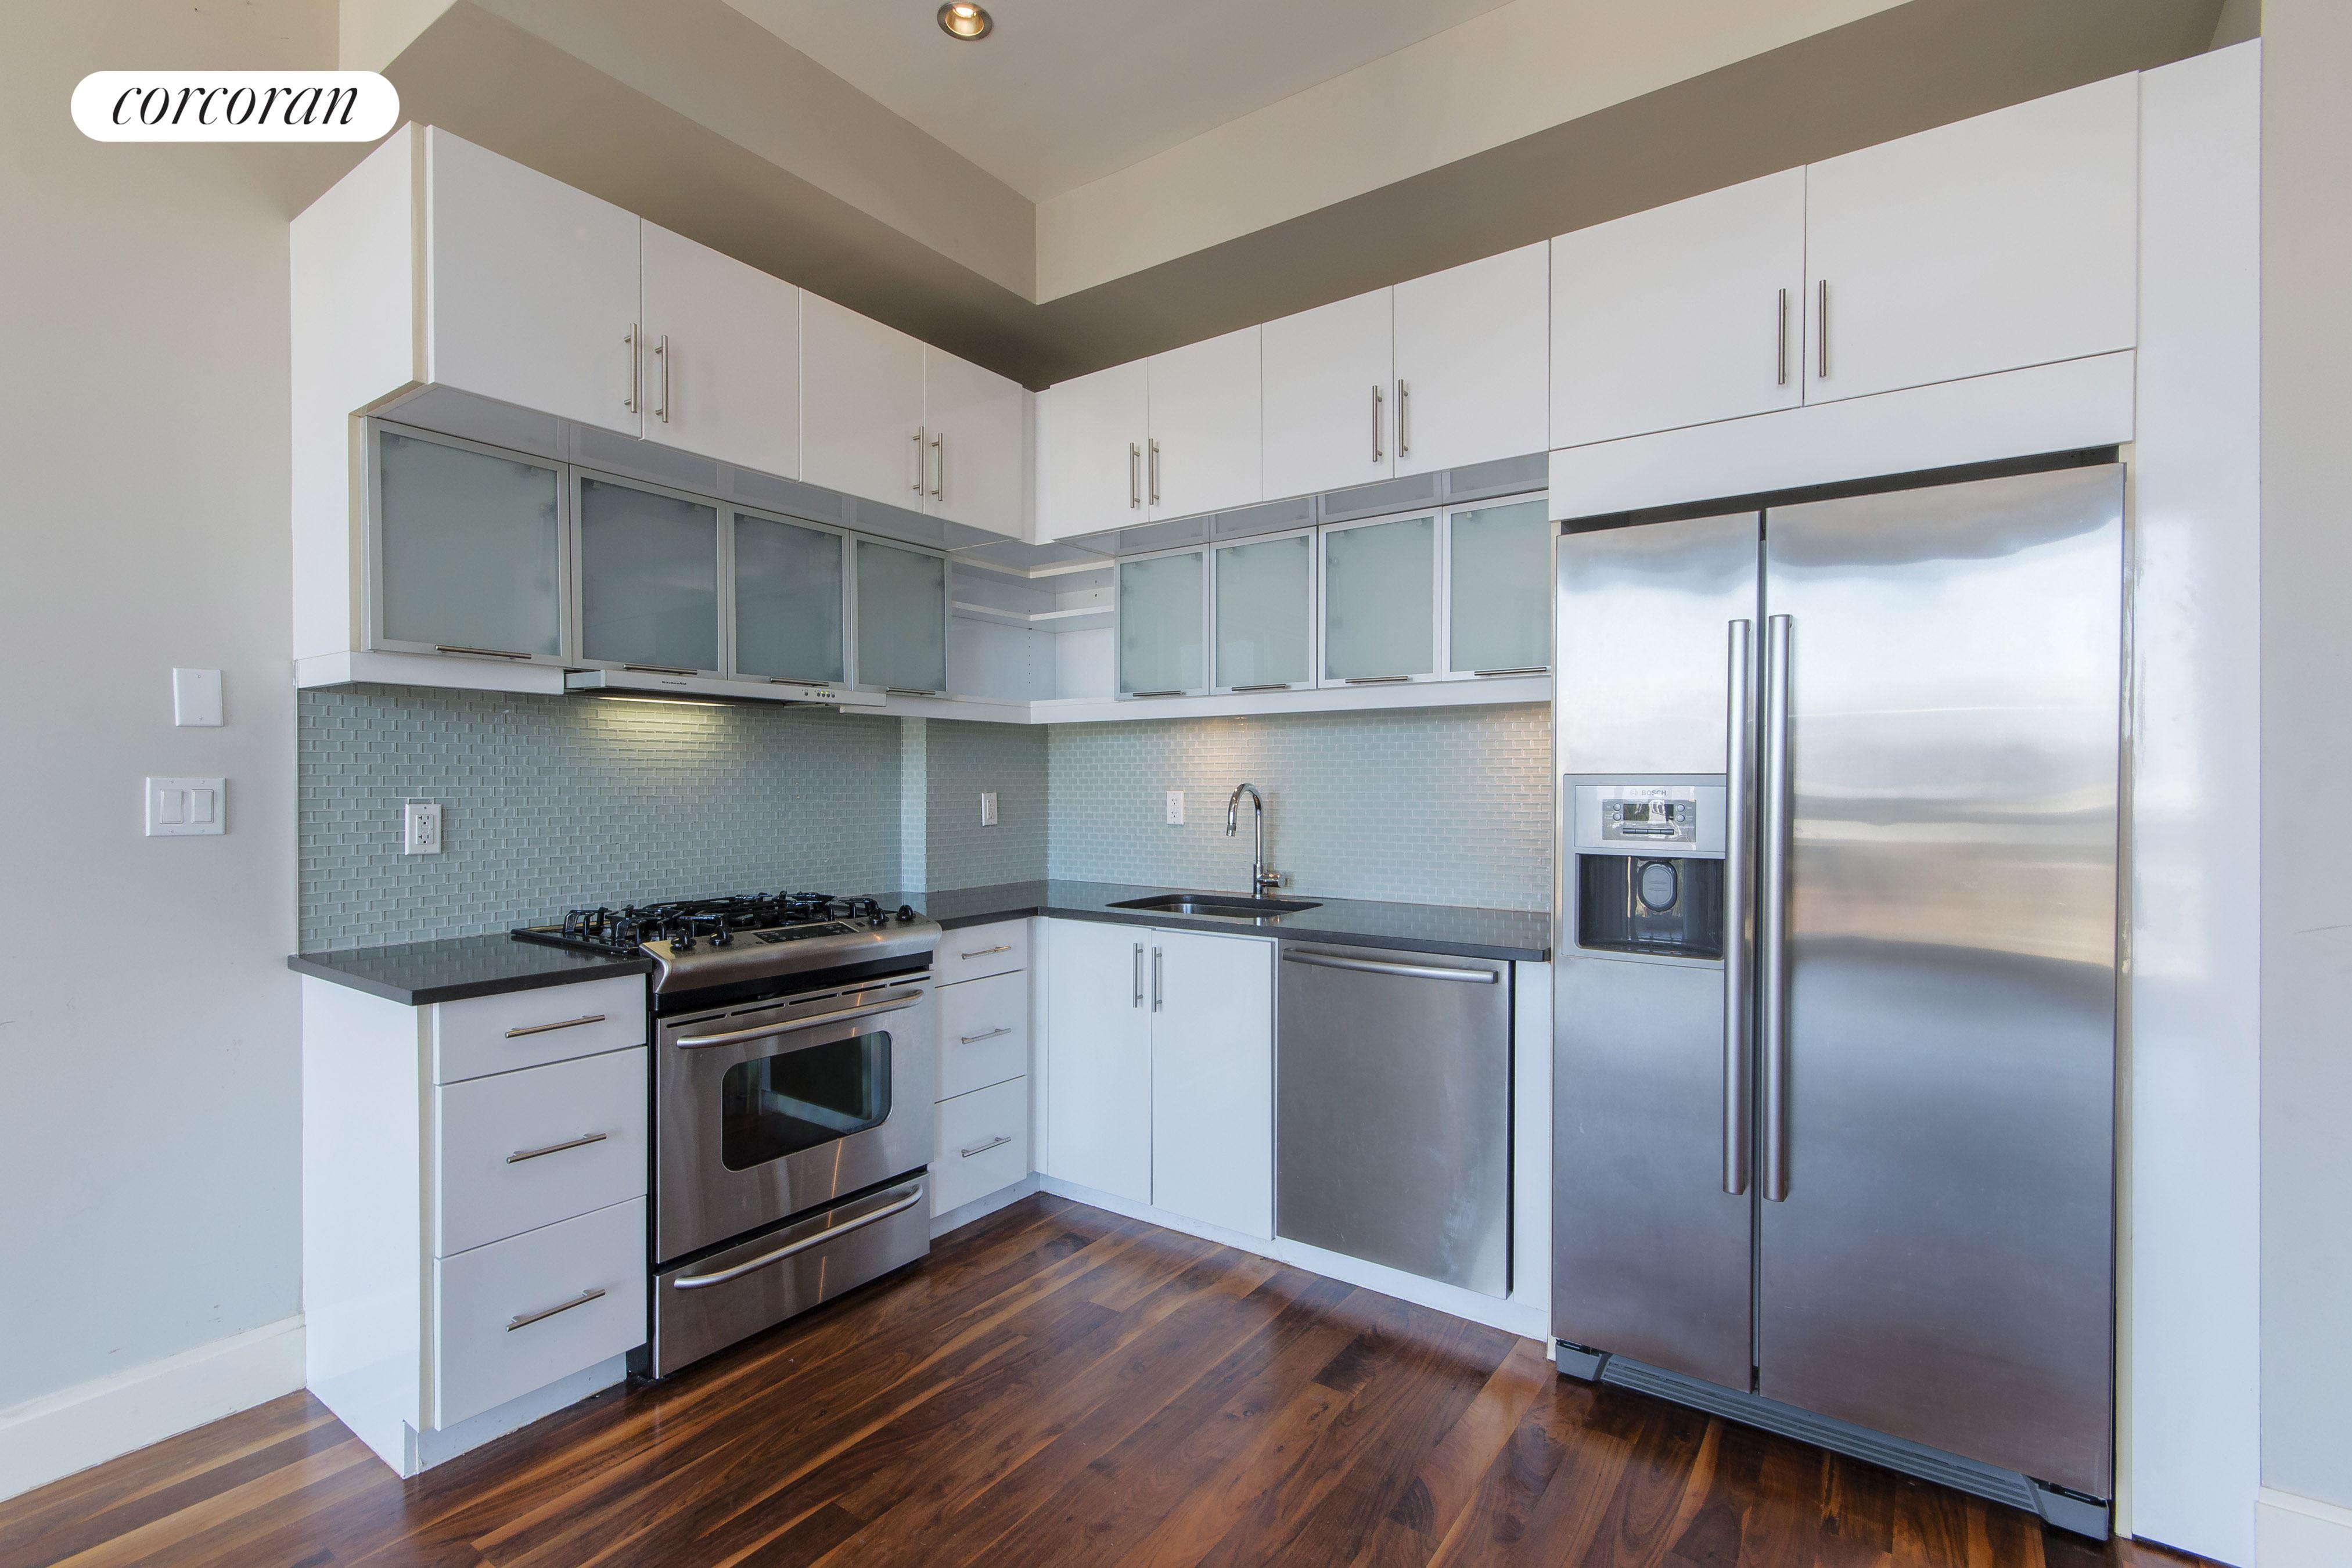 Corcoran, 655 Washington Avenue, Apt. 5B, Prospect Heights Real ...